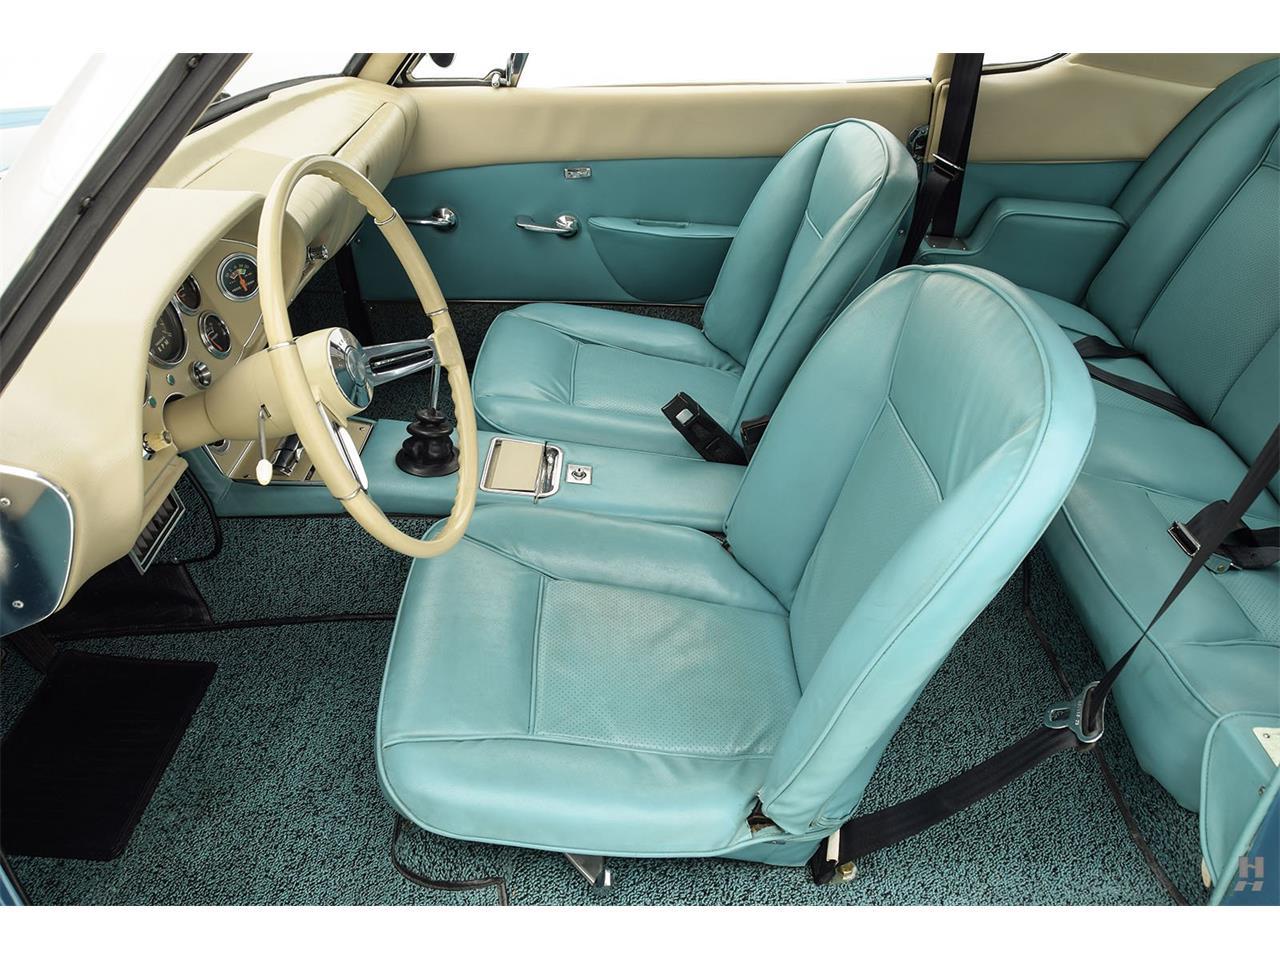 Large Picture of '63 Studebaker Avanti - $77,500.00 - MGHN